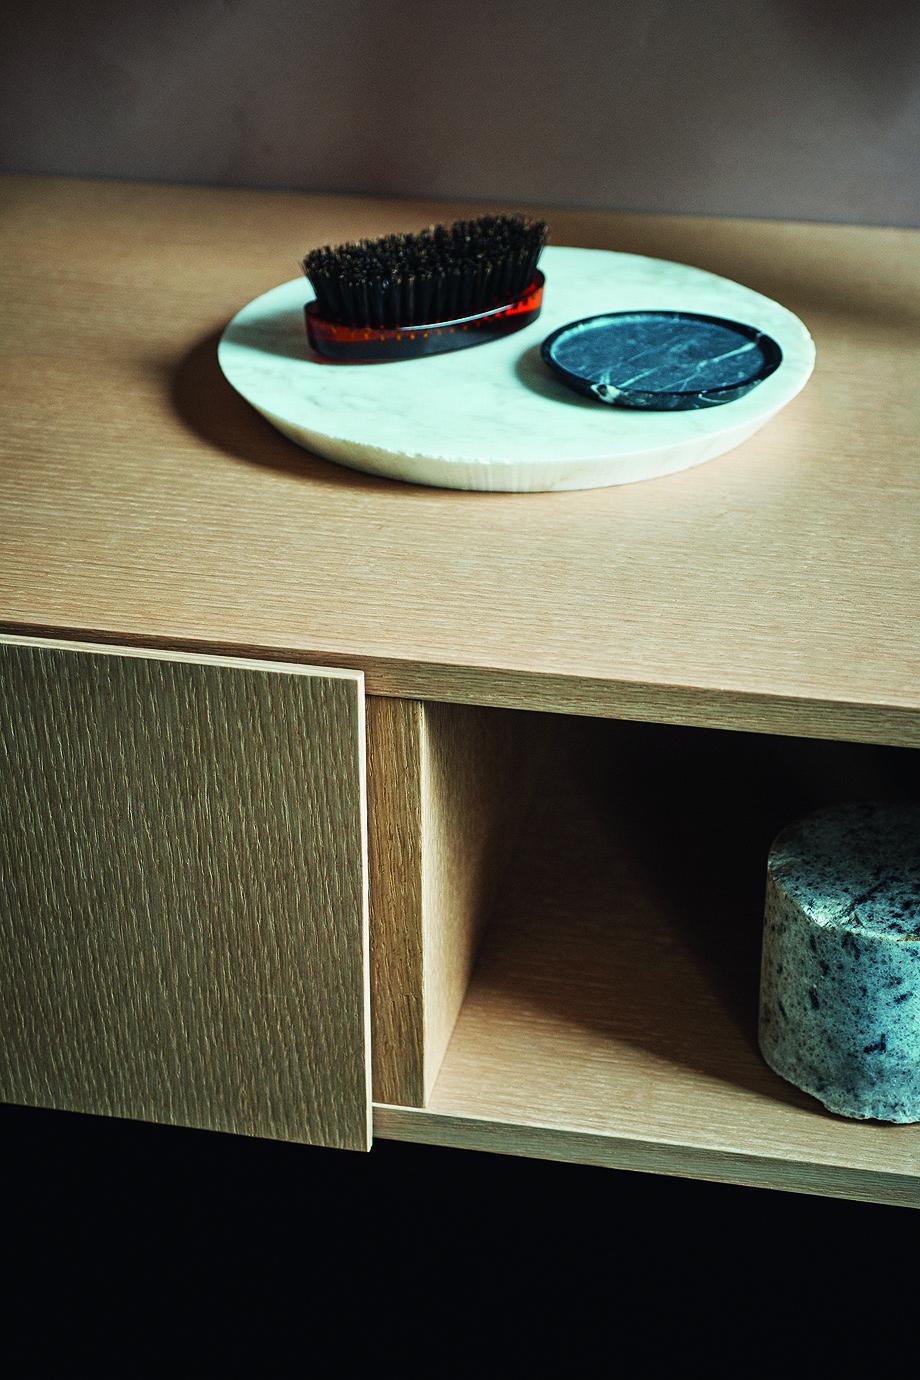 mobiliario lato de benedini associati y agape (3)